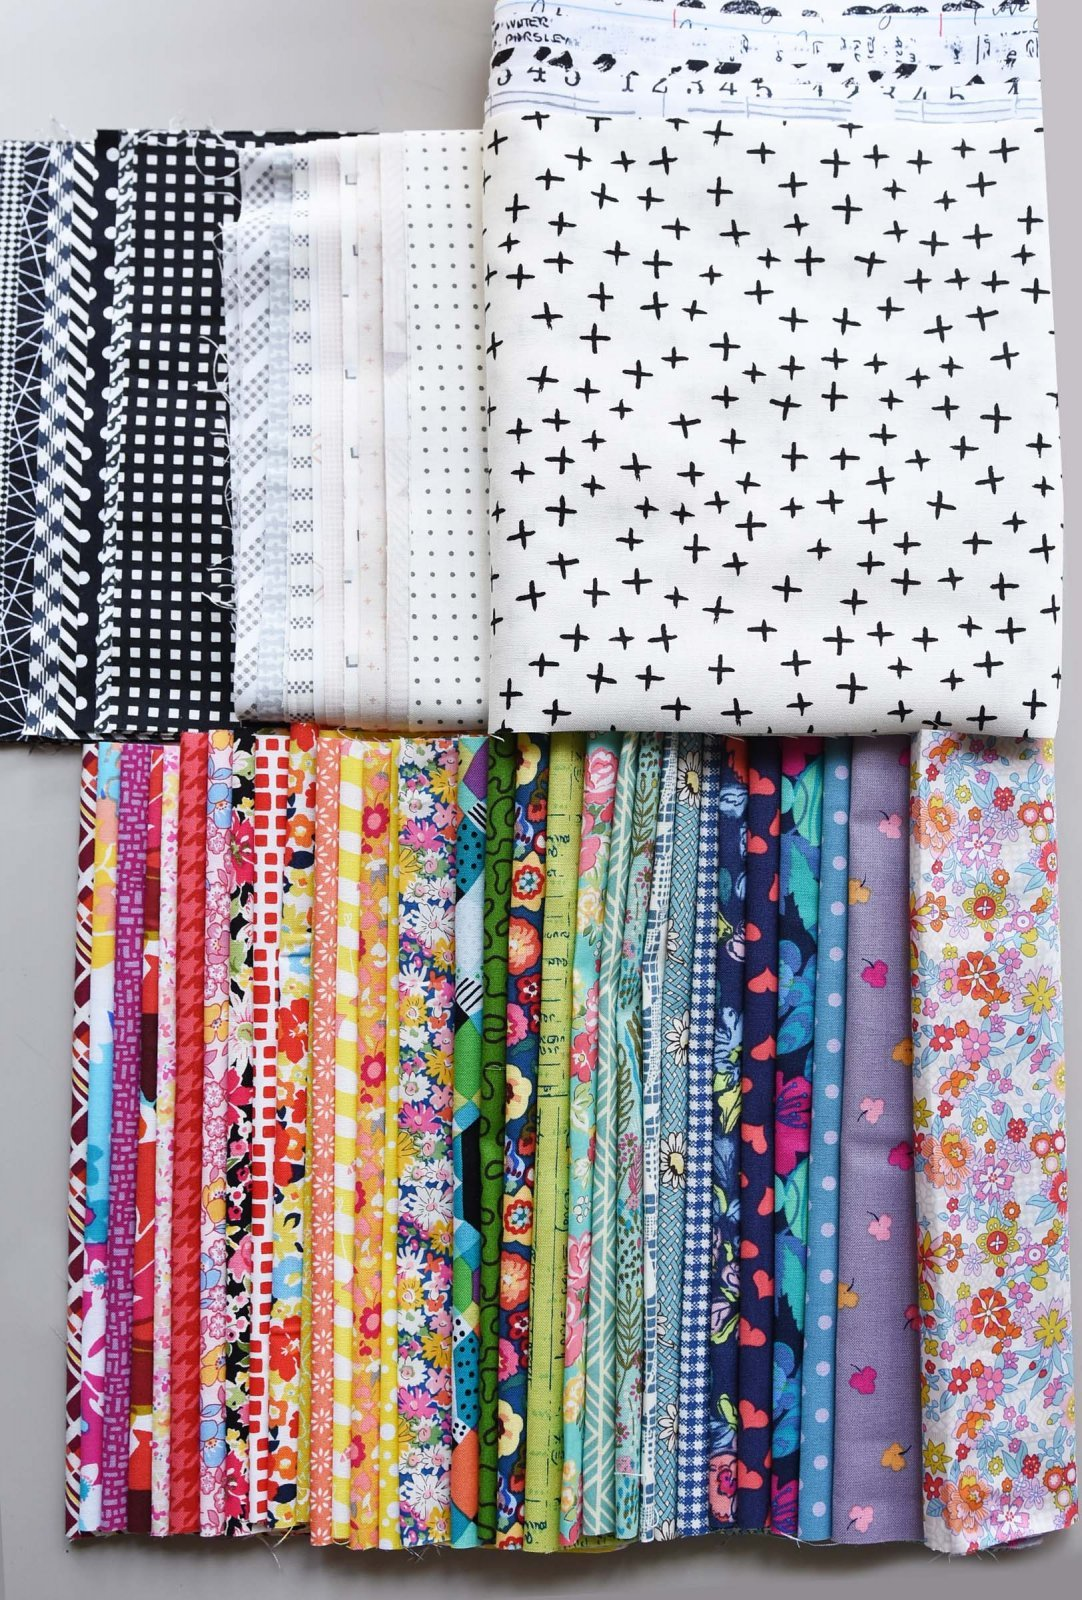 The Avenue - Large Kit - Fabric, Pattern & Templates